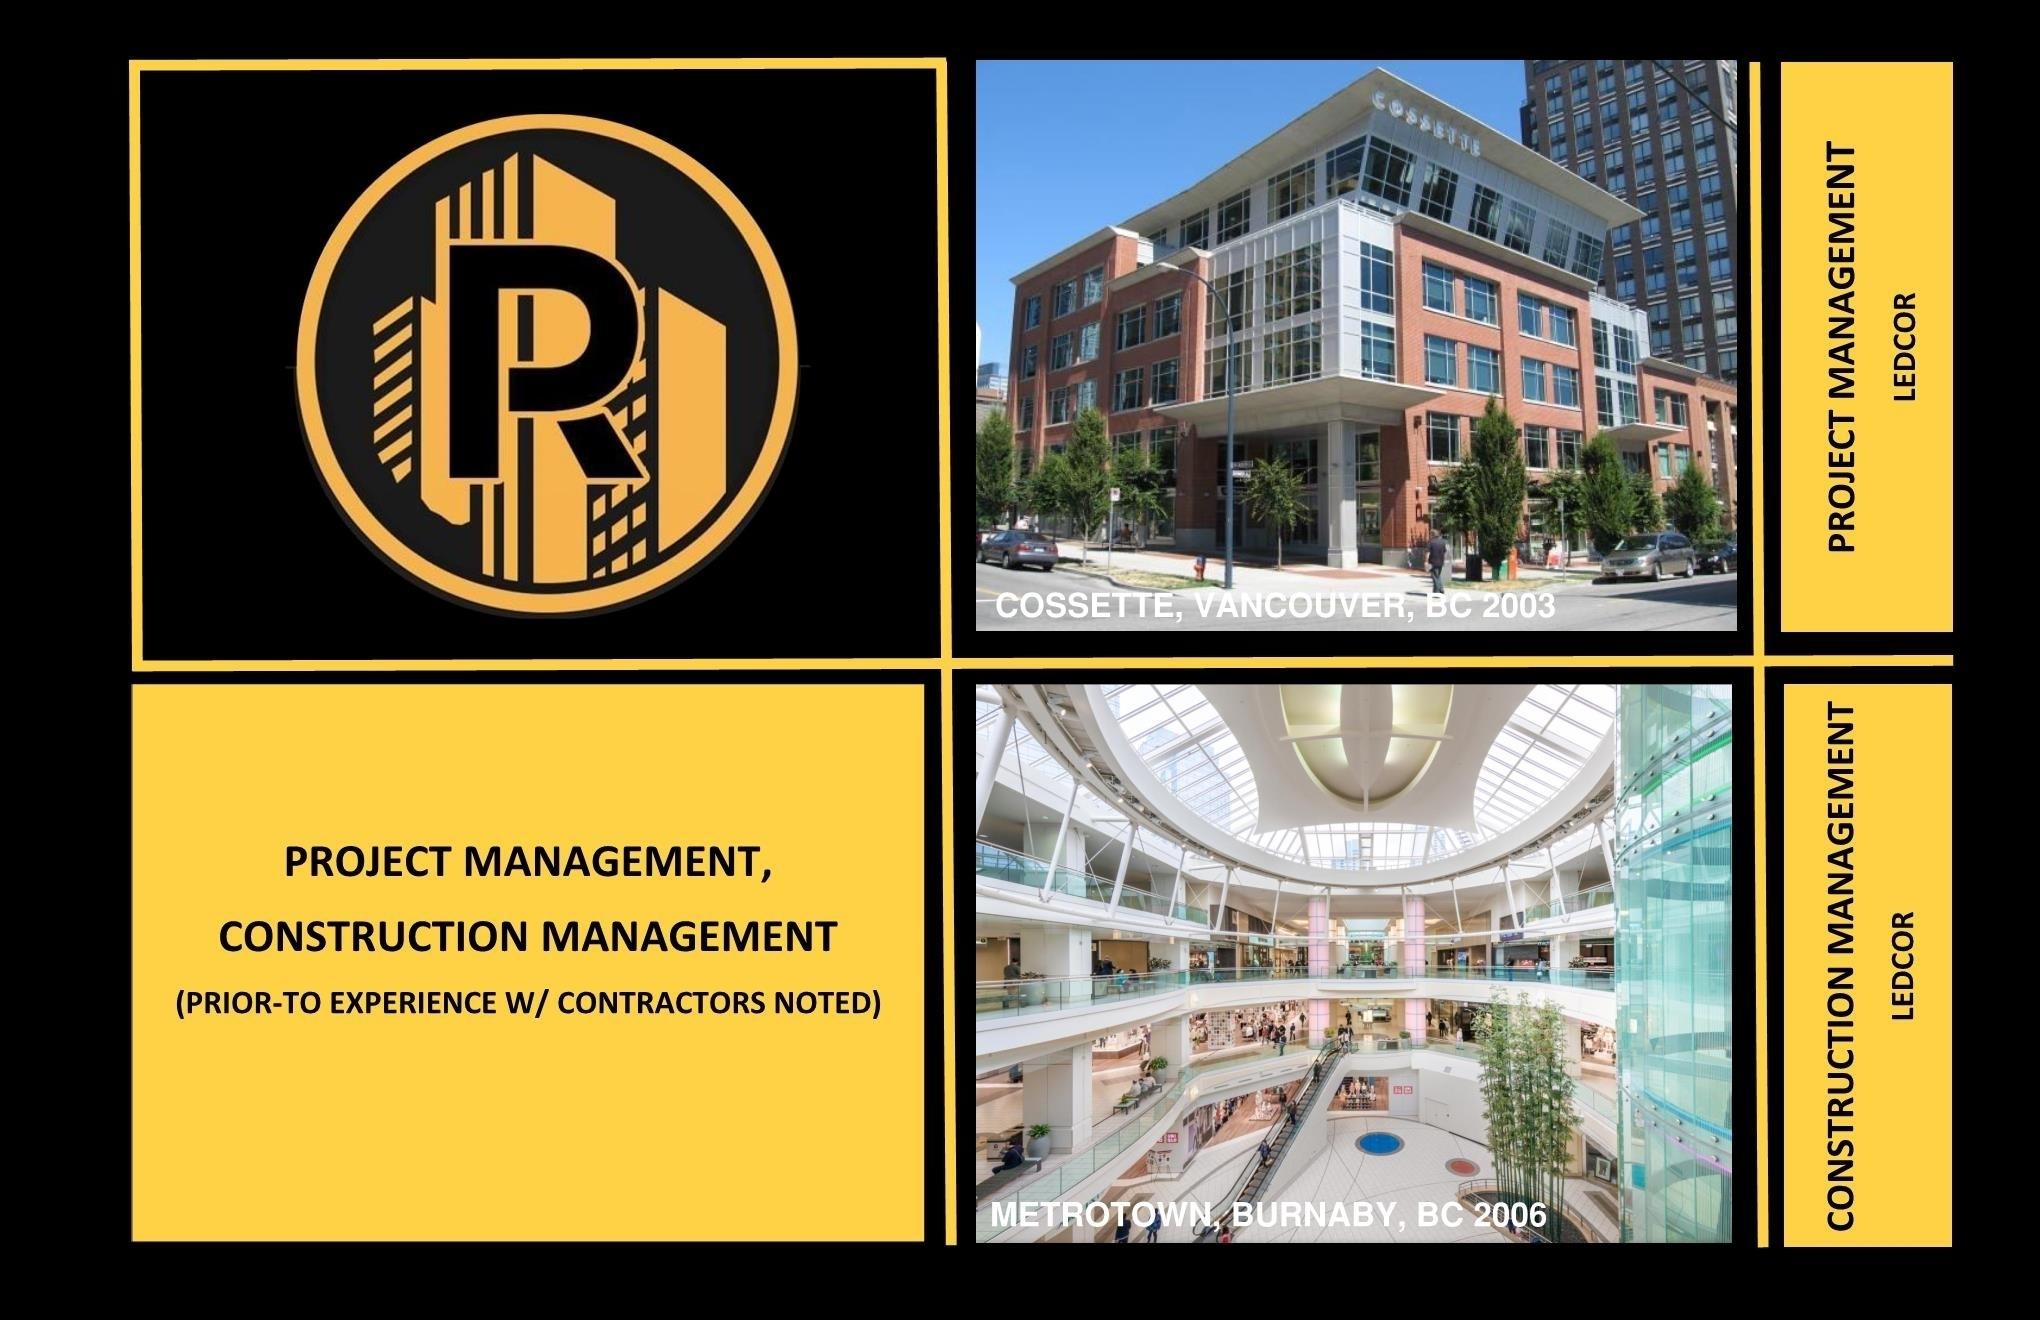 Raudales Enterprise LTD in Vancouver: General Contracting Project Management Construction Management Tenant Improvements